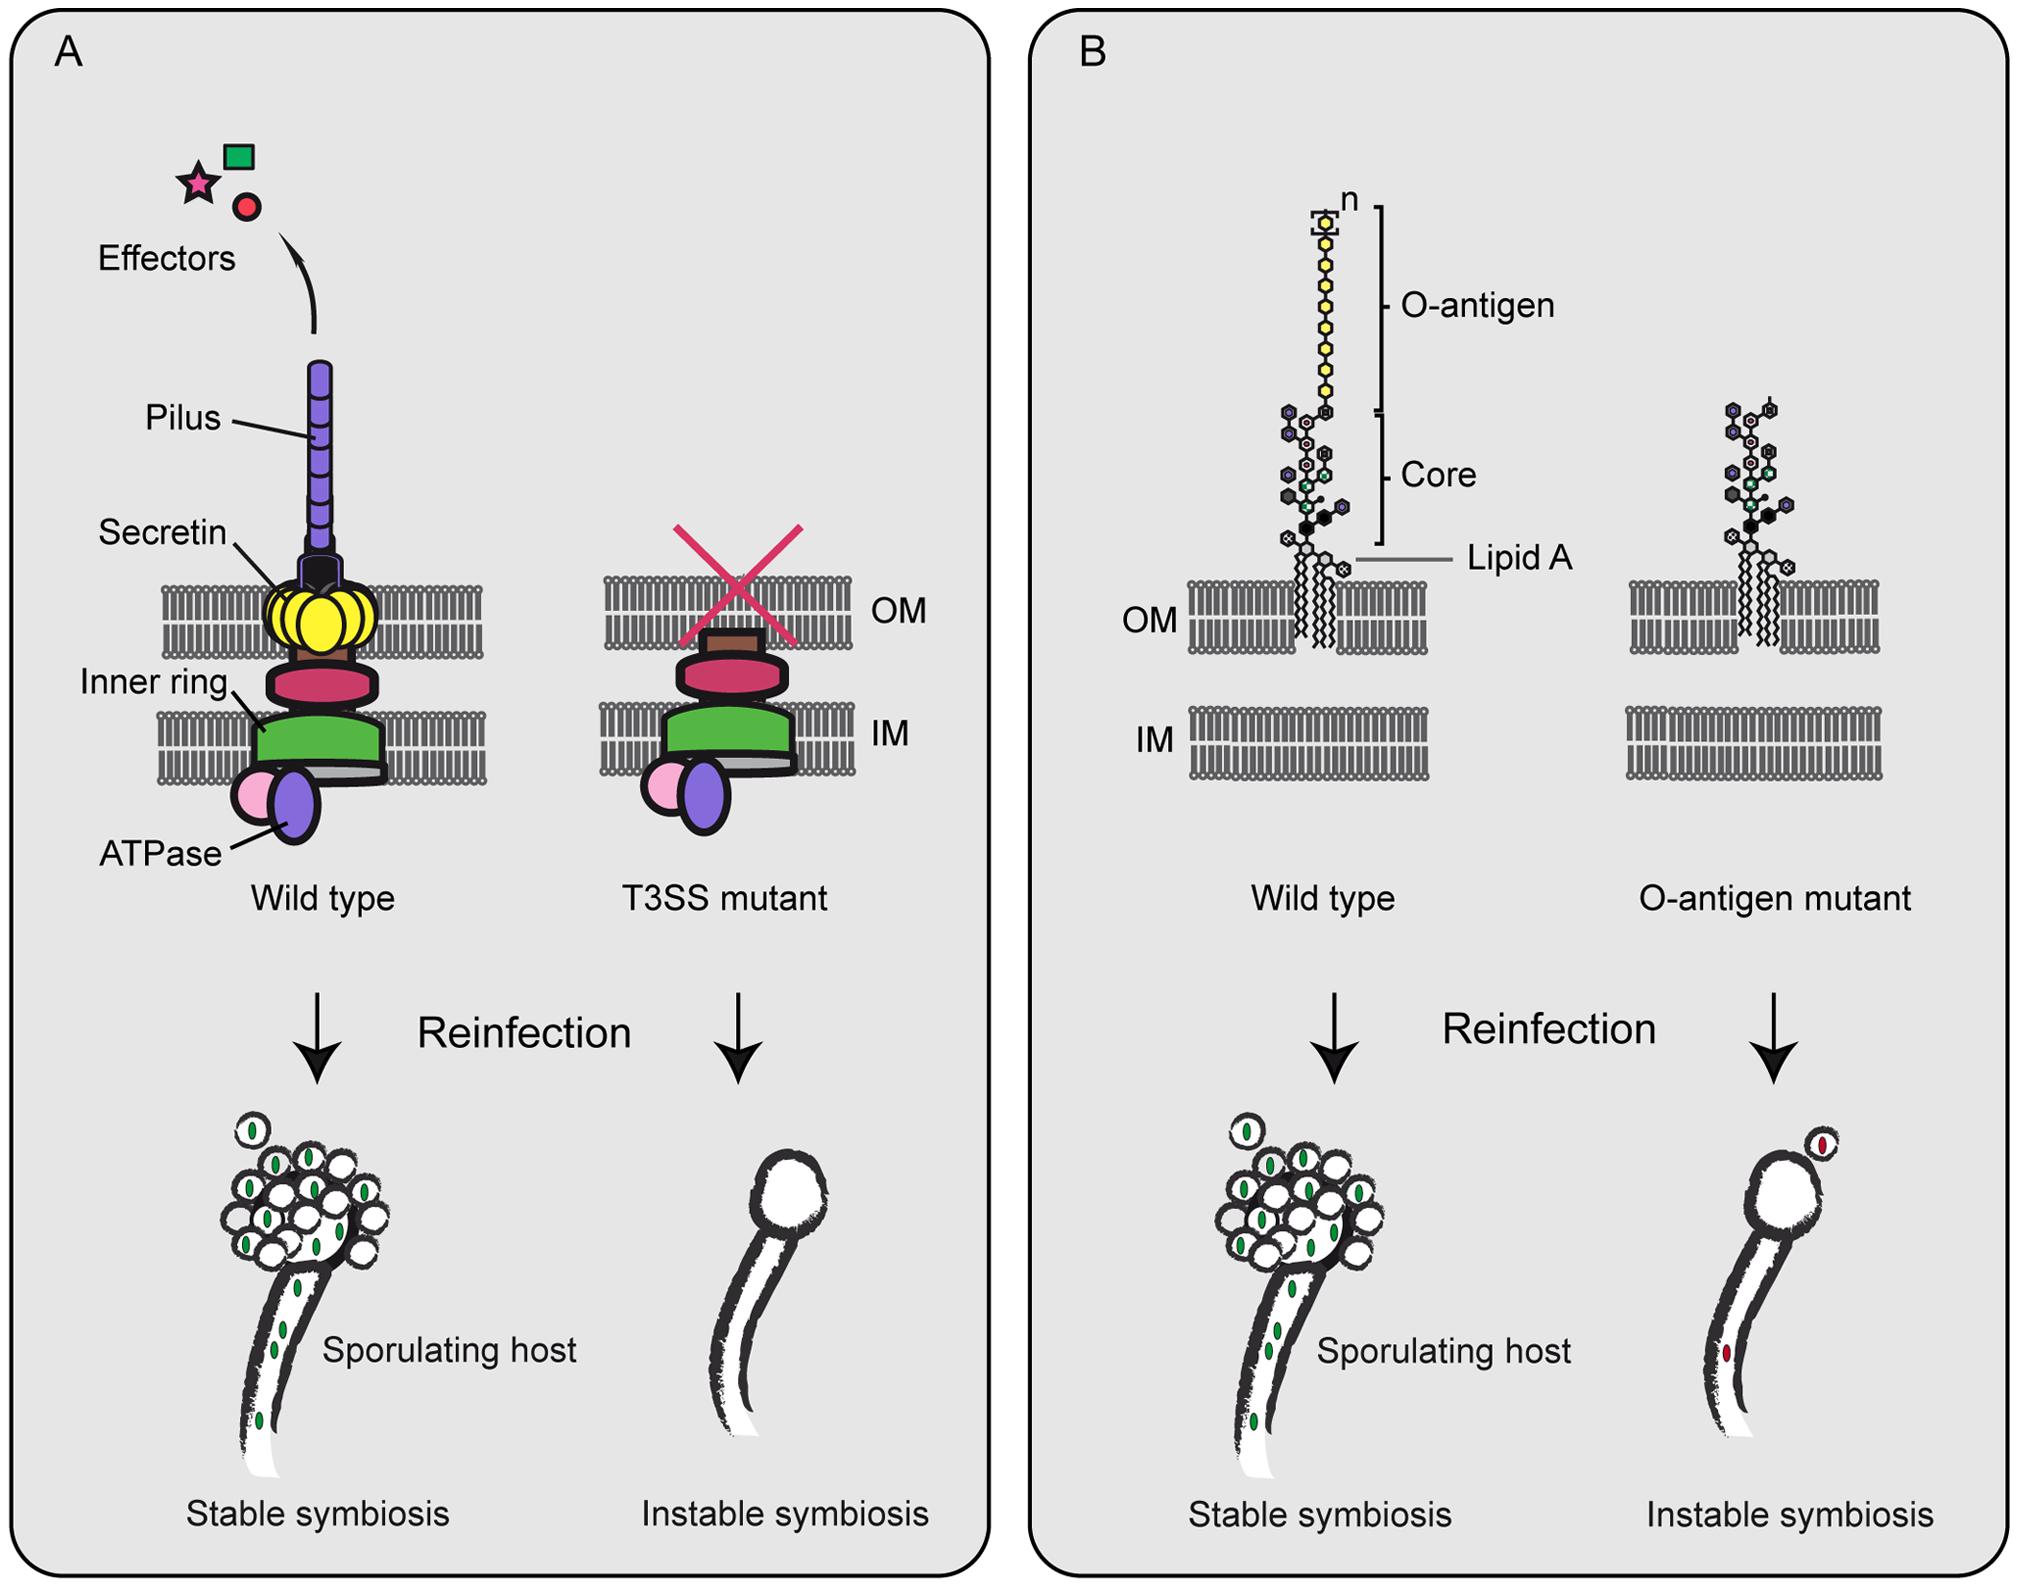 Symbiosis factors of <i>B. rhizoxinica</i>.